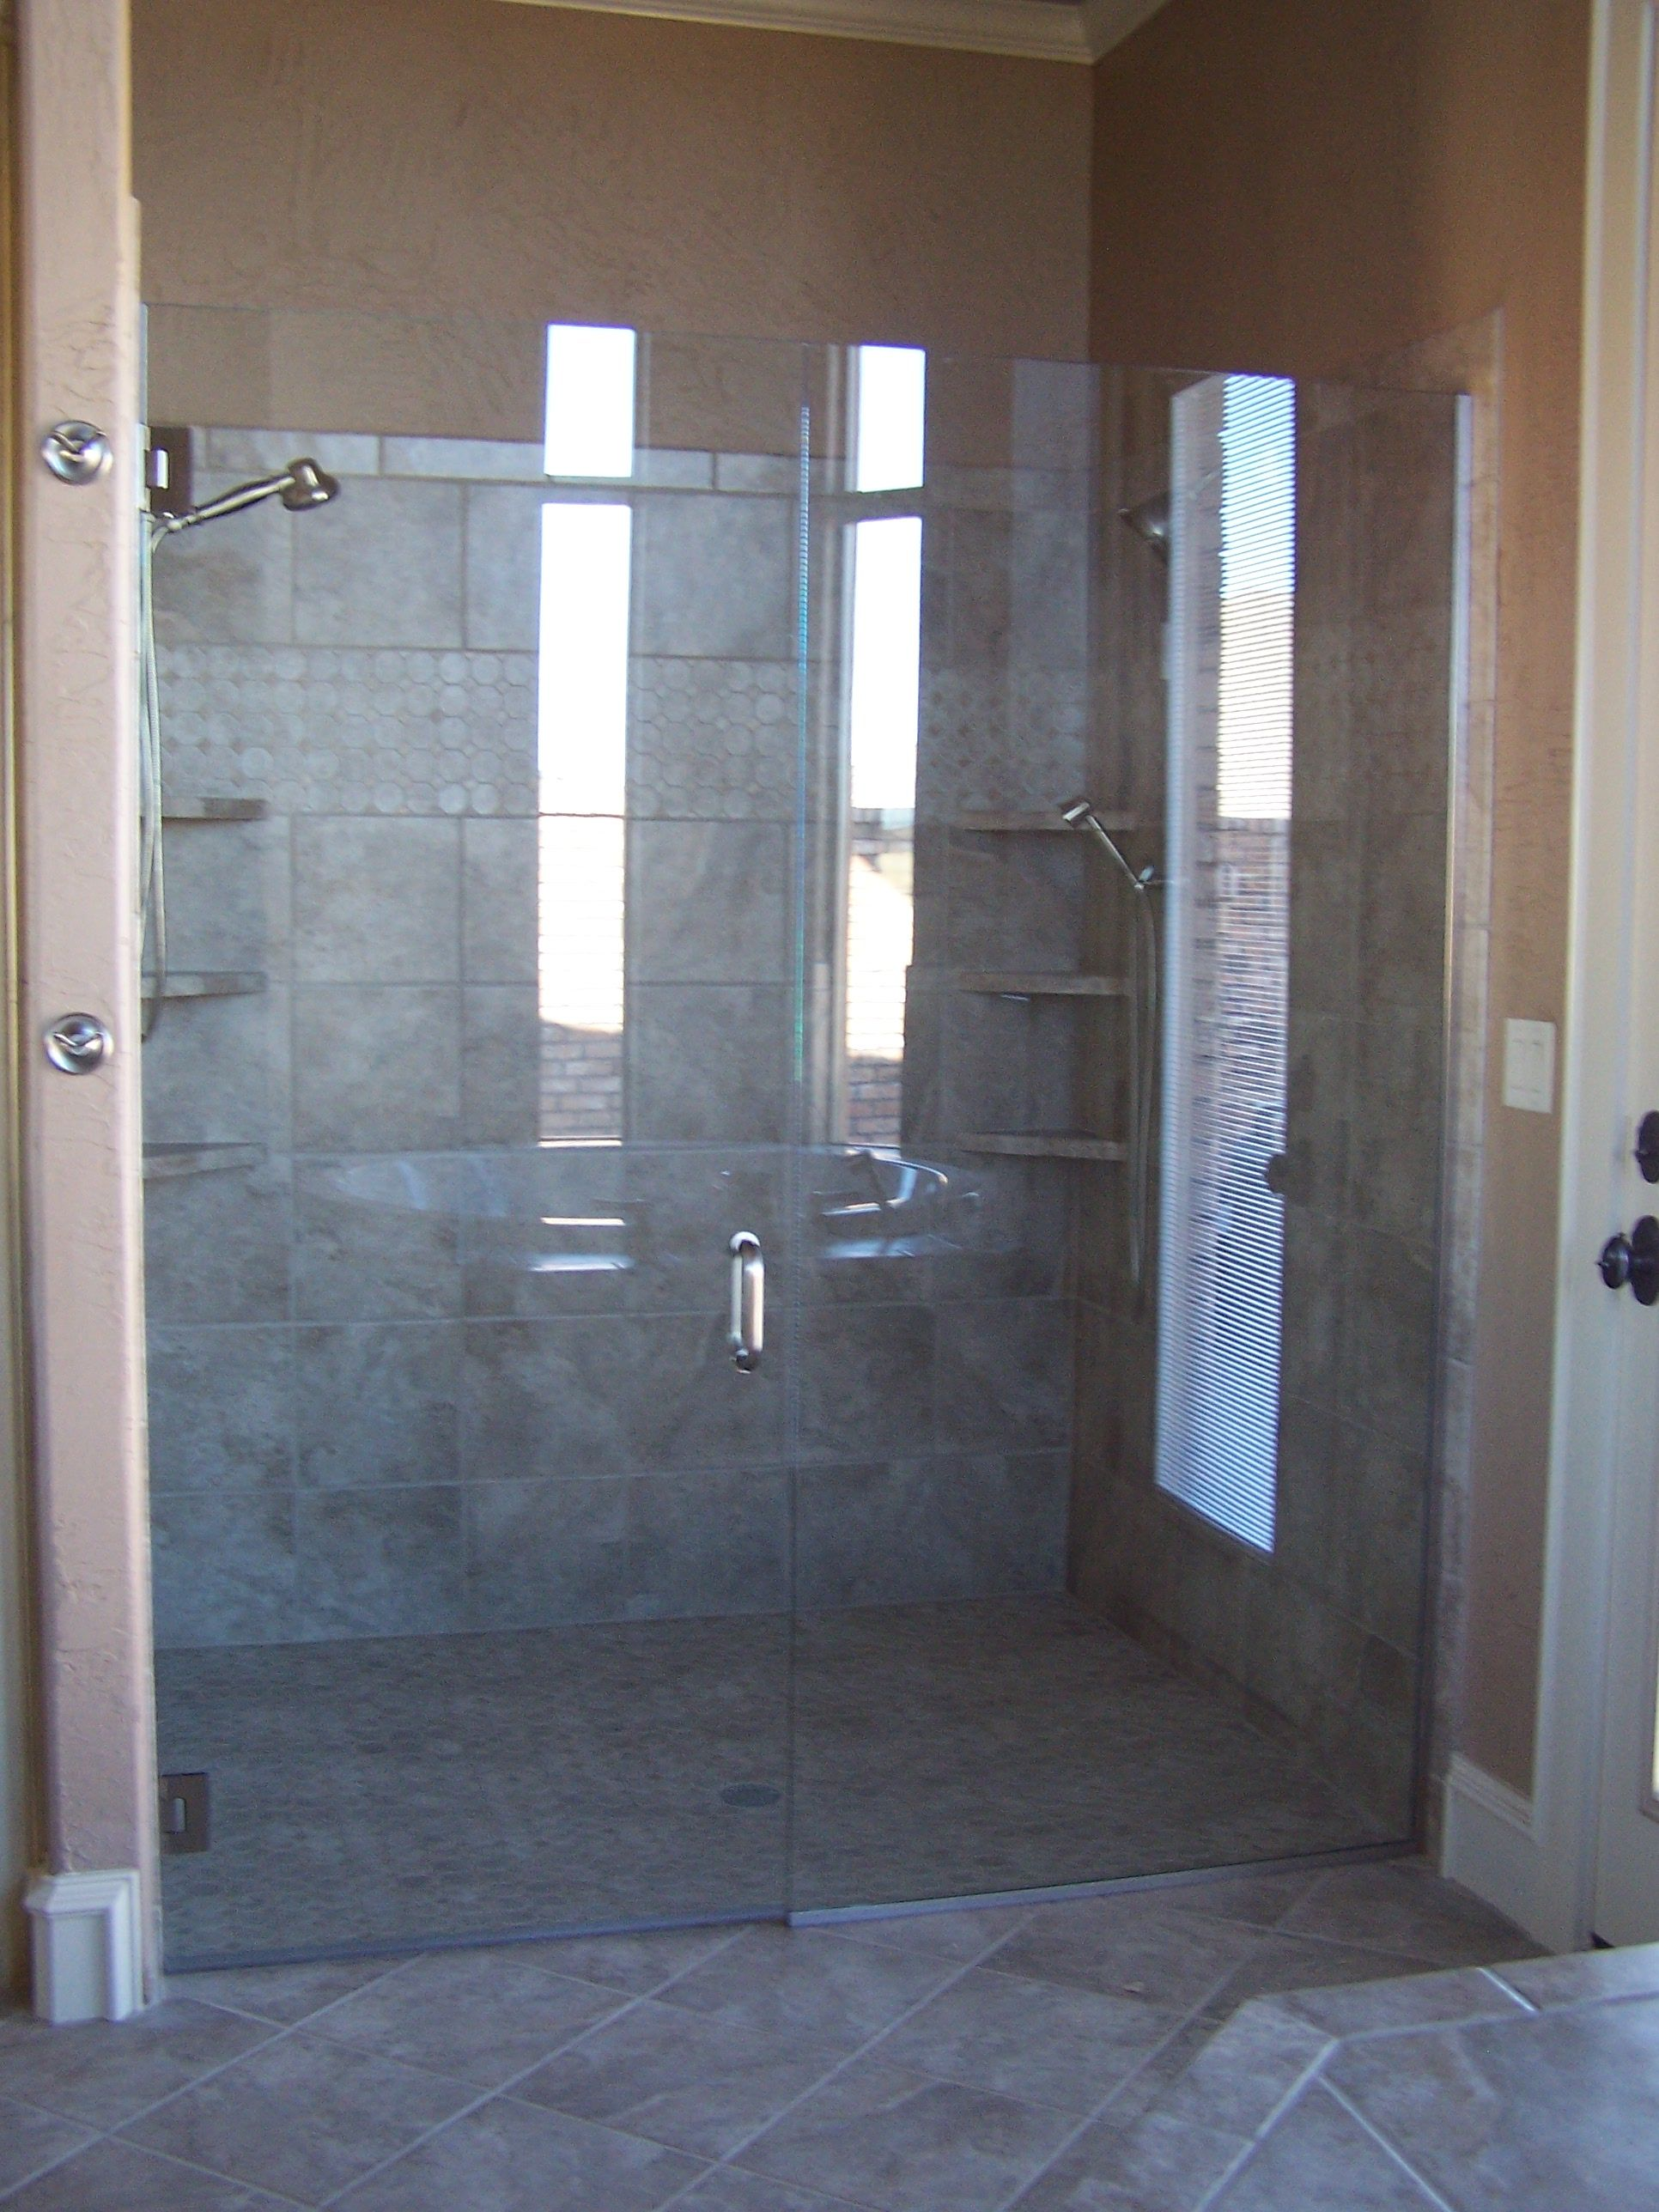 Towel Hook Placement Love The Shower Doors Shower Doors Home Furnishings Home